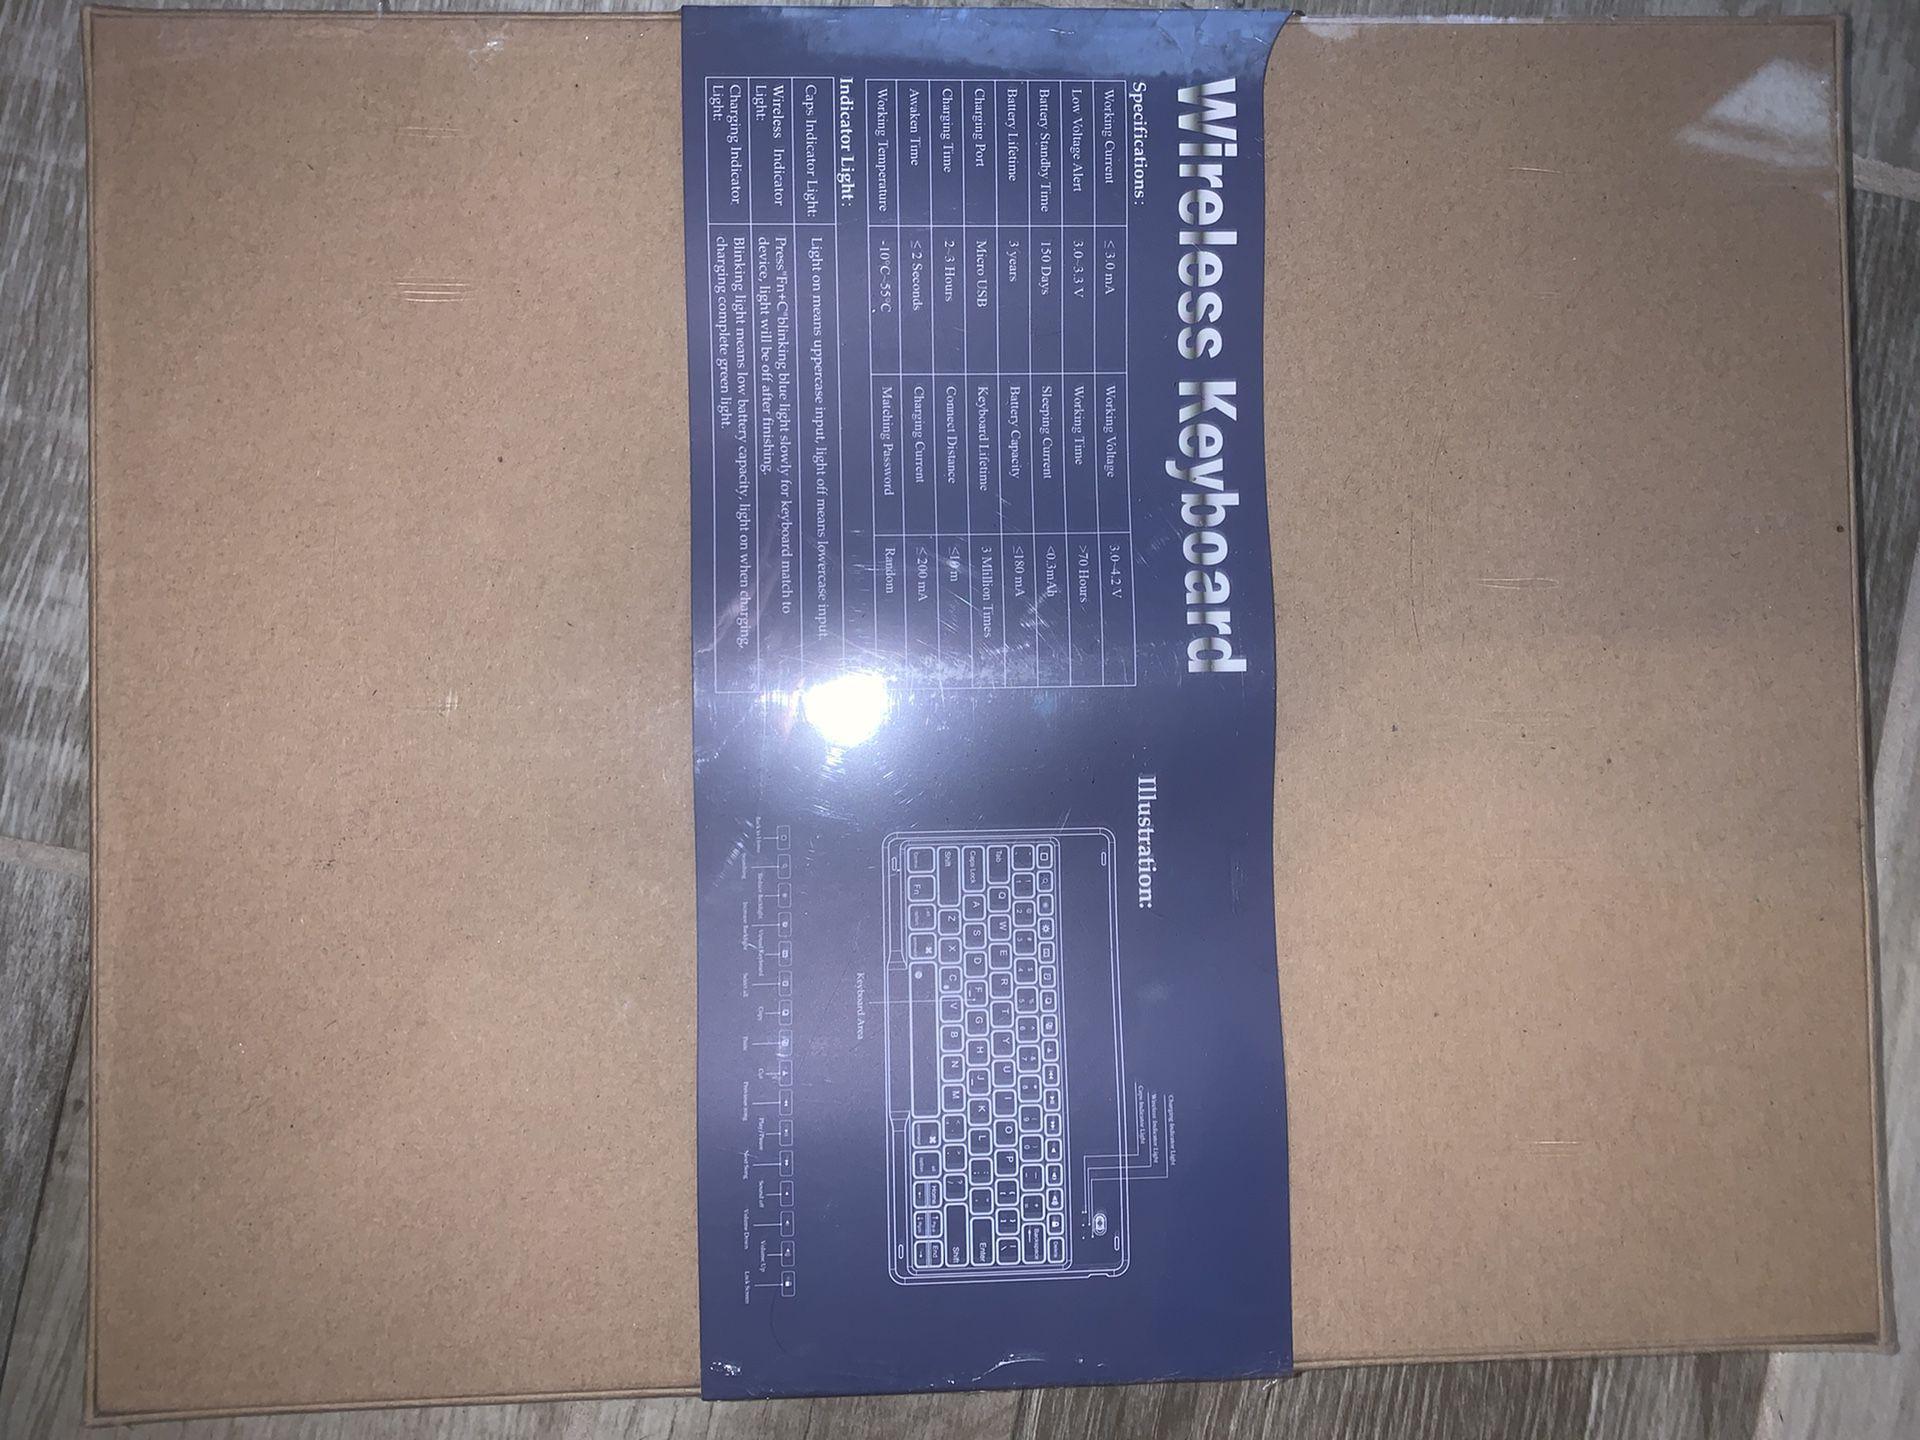 IVSO Wireless Keyboard For iPad